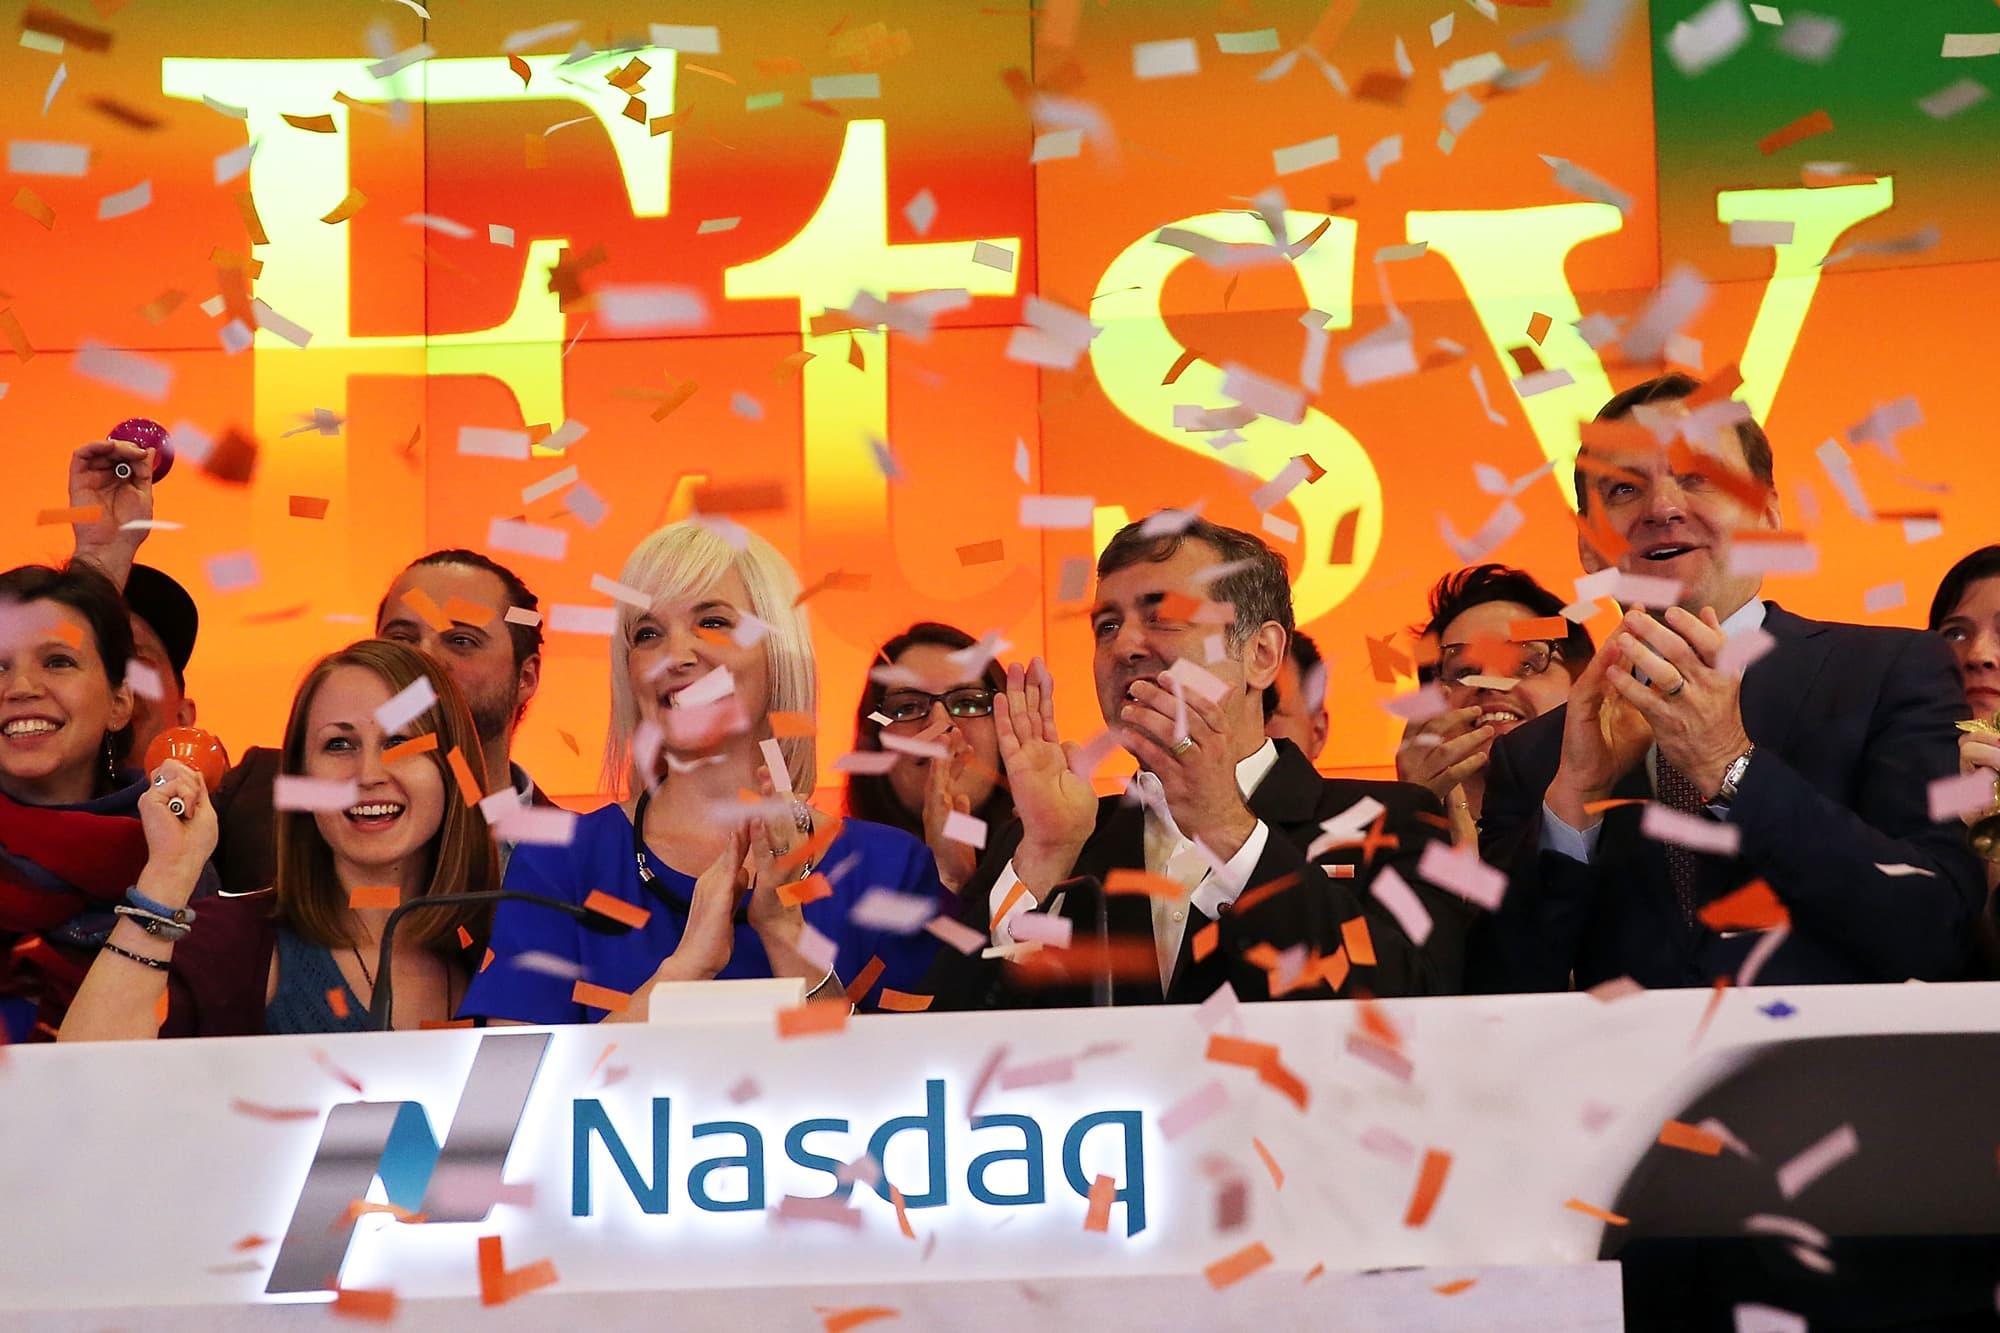 Stocks making the biggest moves midday: Etsy, Virgin Galactic, Foot Locker & more